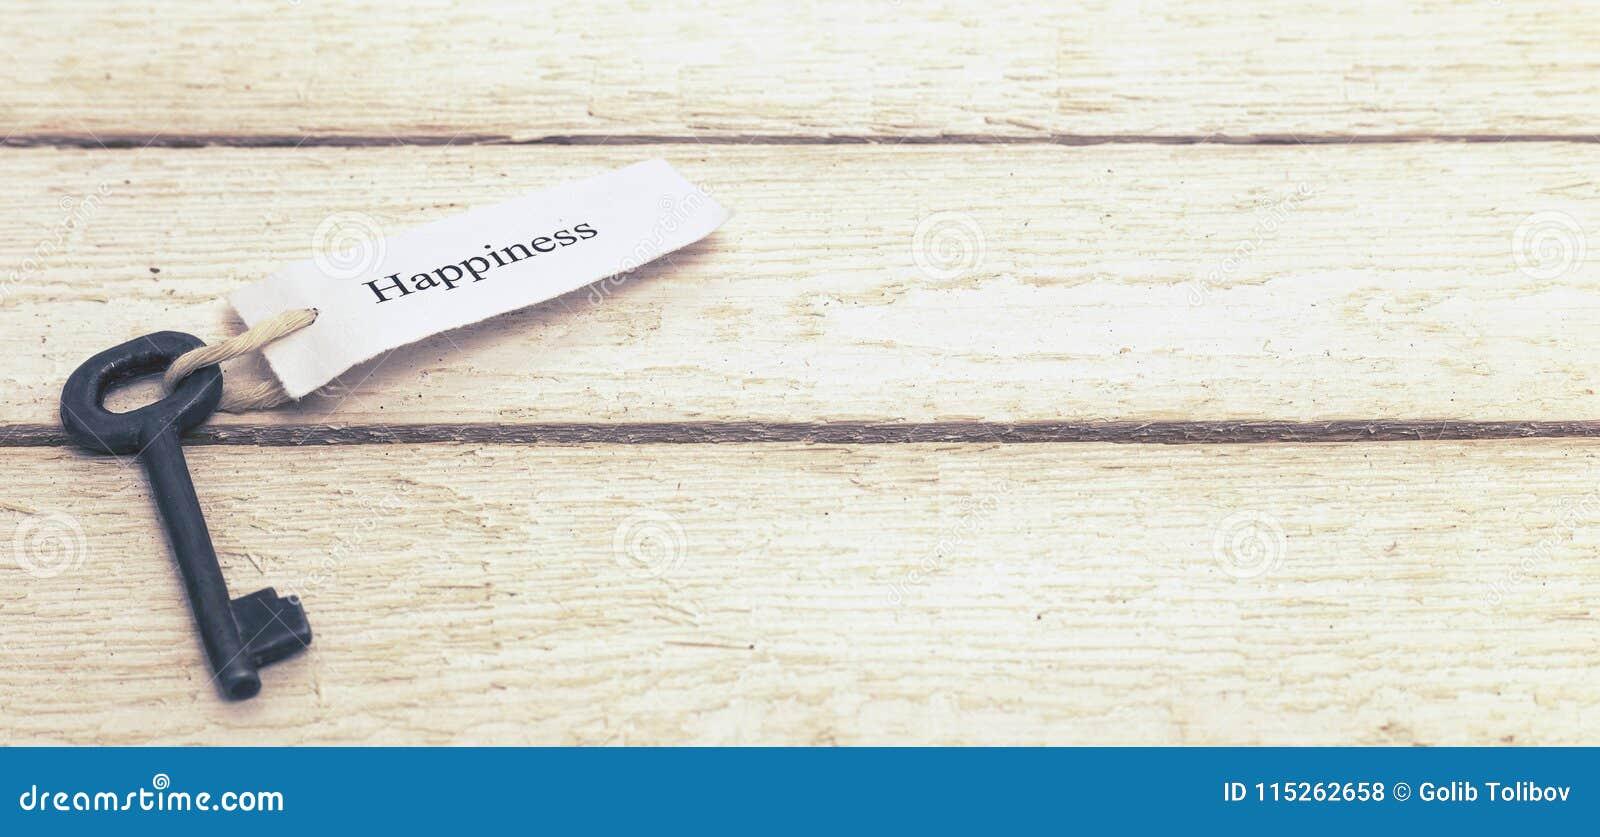 Sleutels tot Geluk - Keychain over witte Houten Achtergrond gestemd